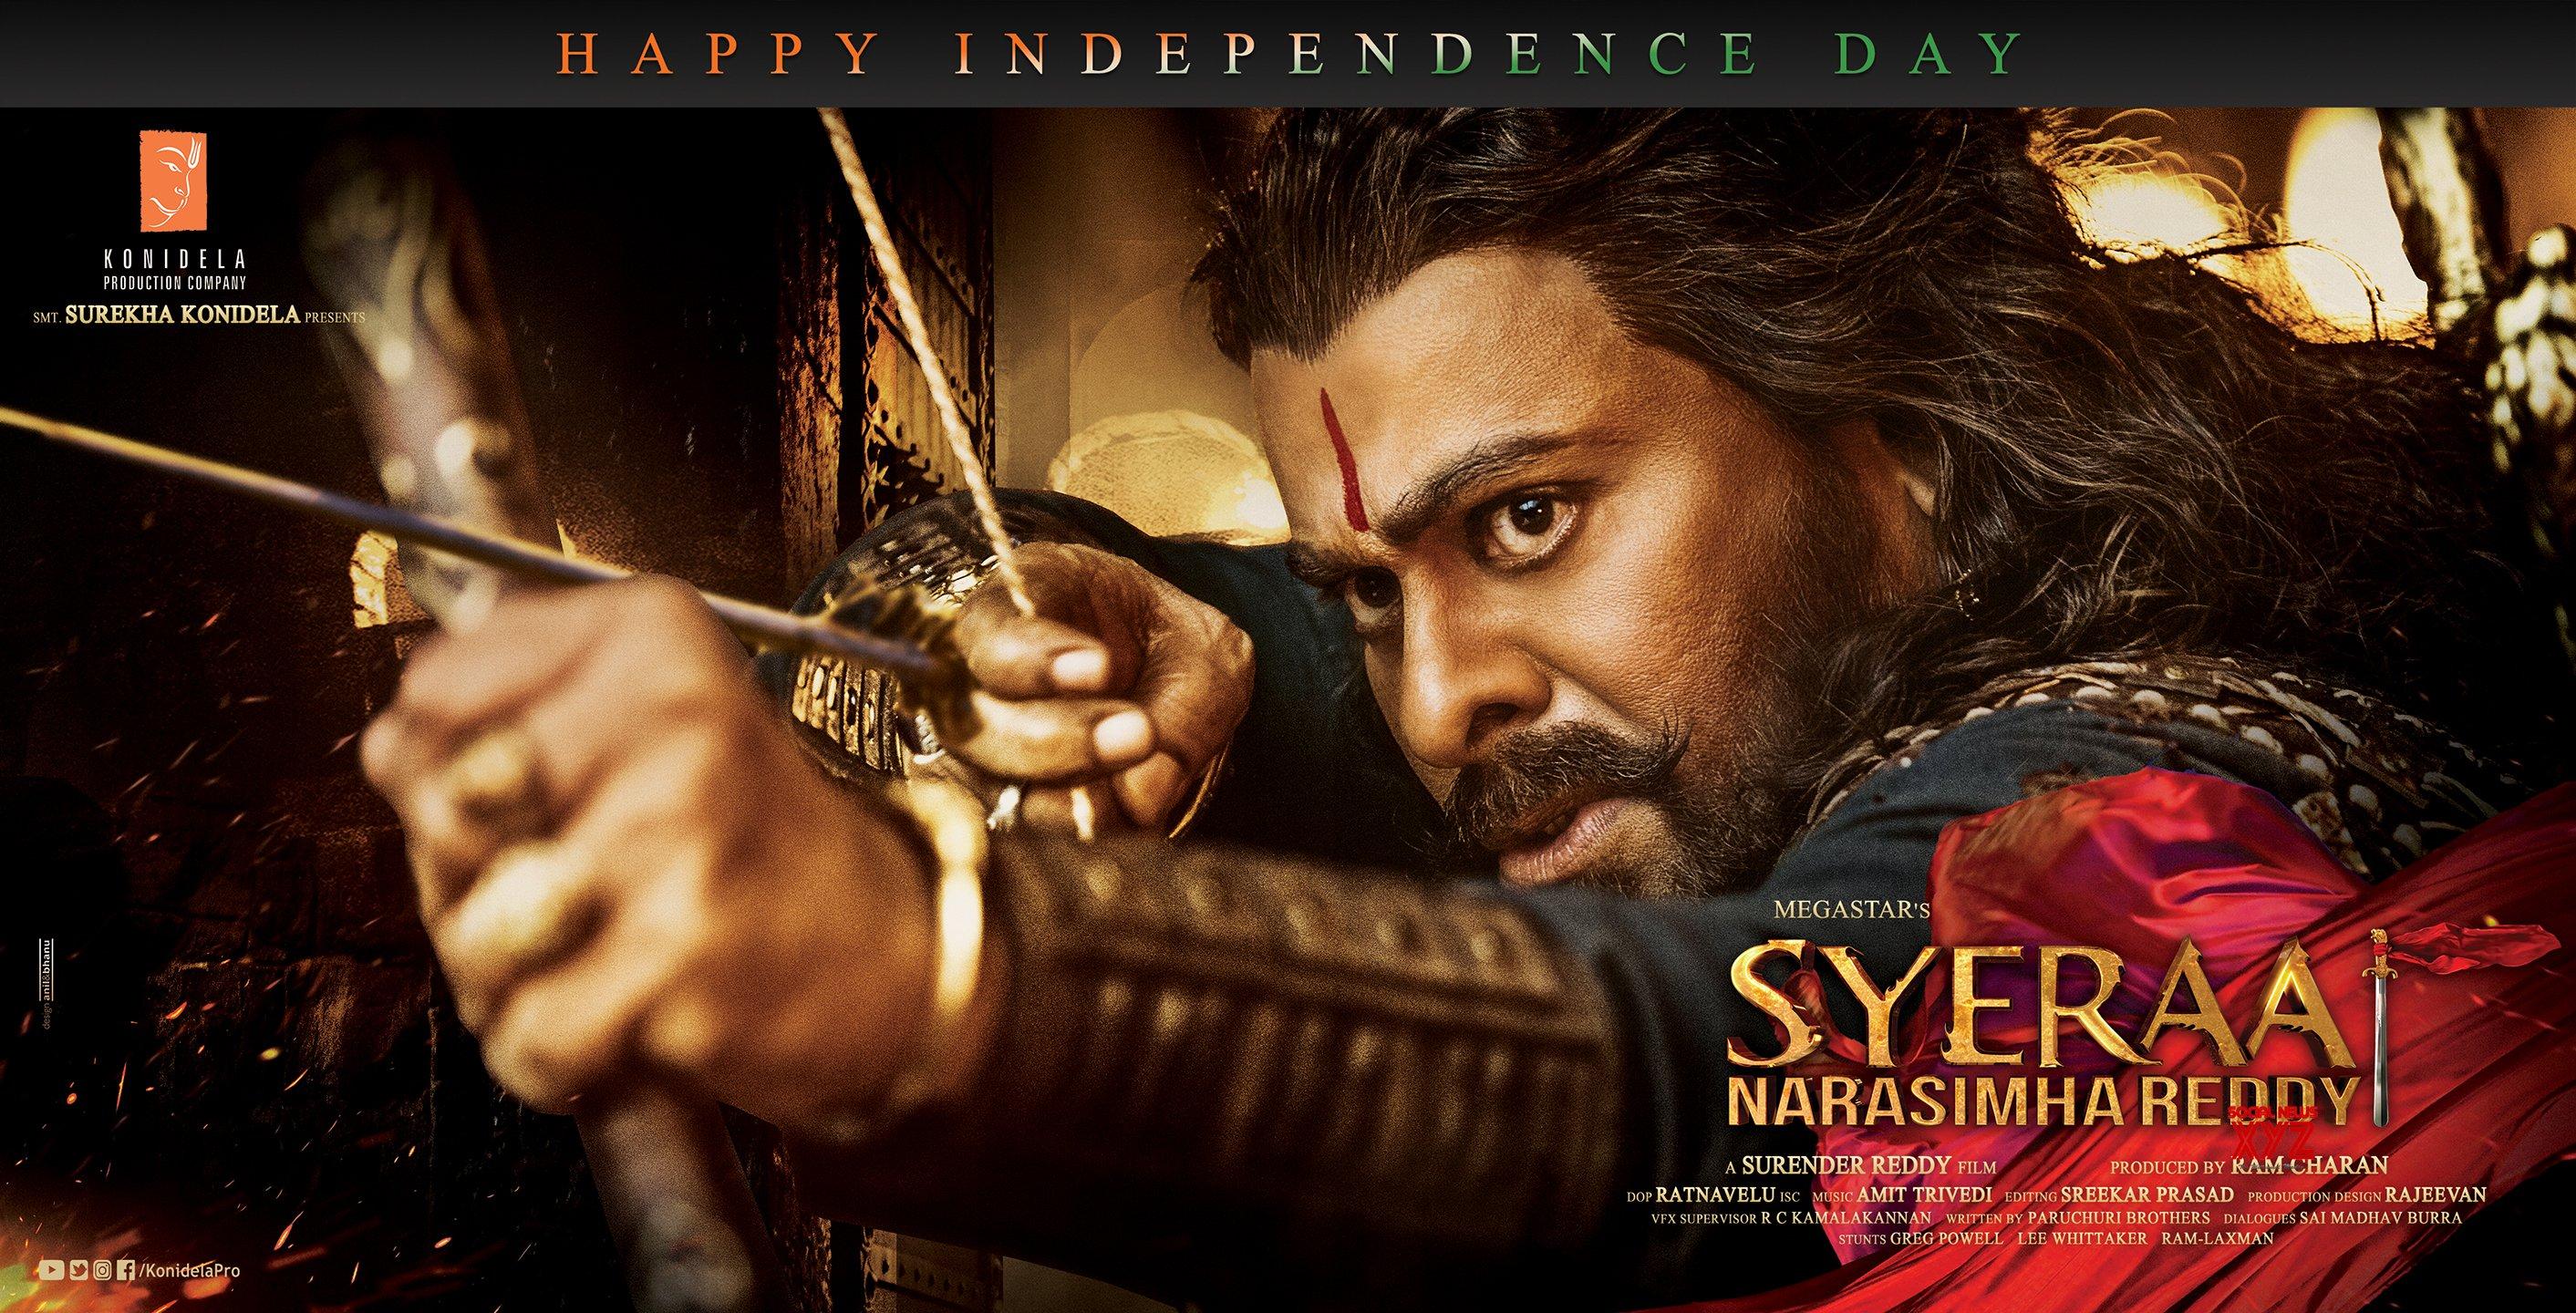 Megastar Chiranjeevi SyeRaa Movie Independence Day HD Poster And Still